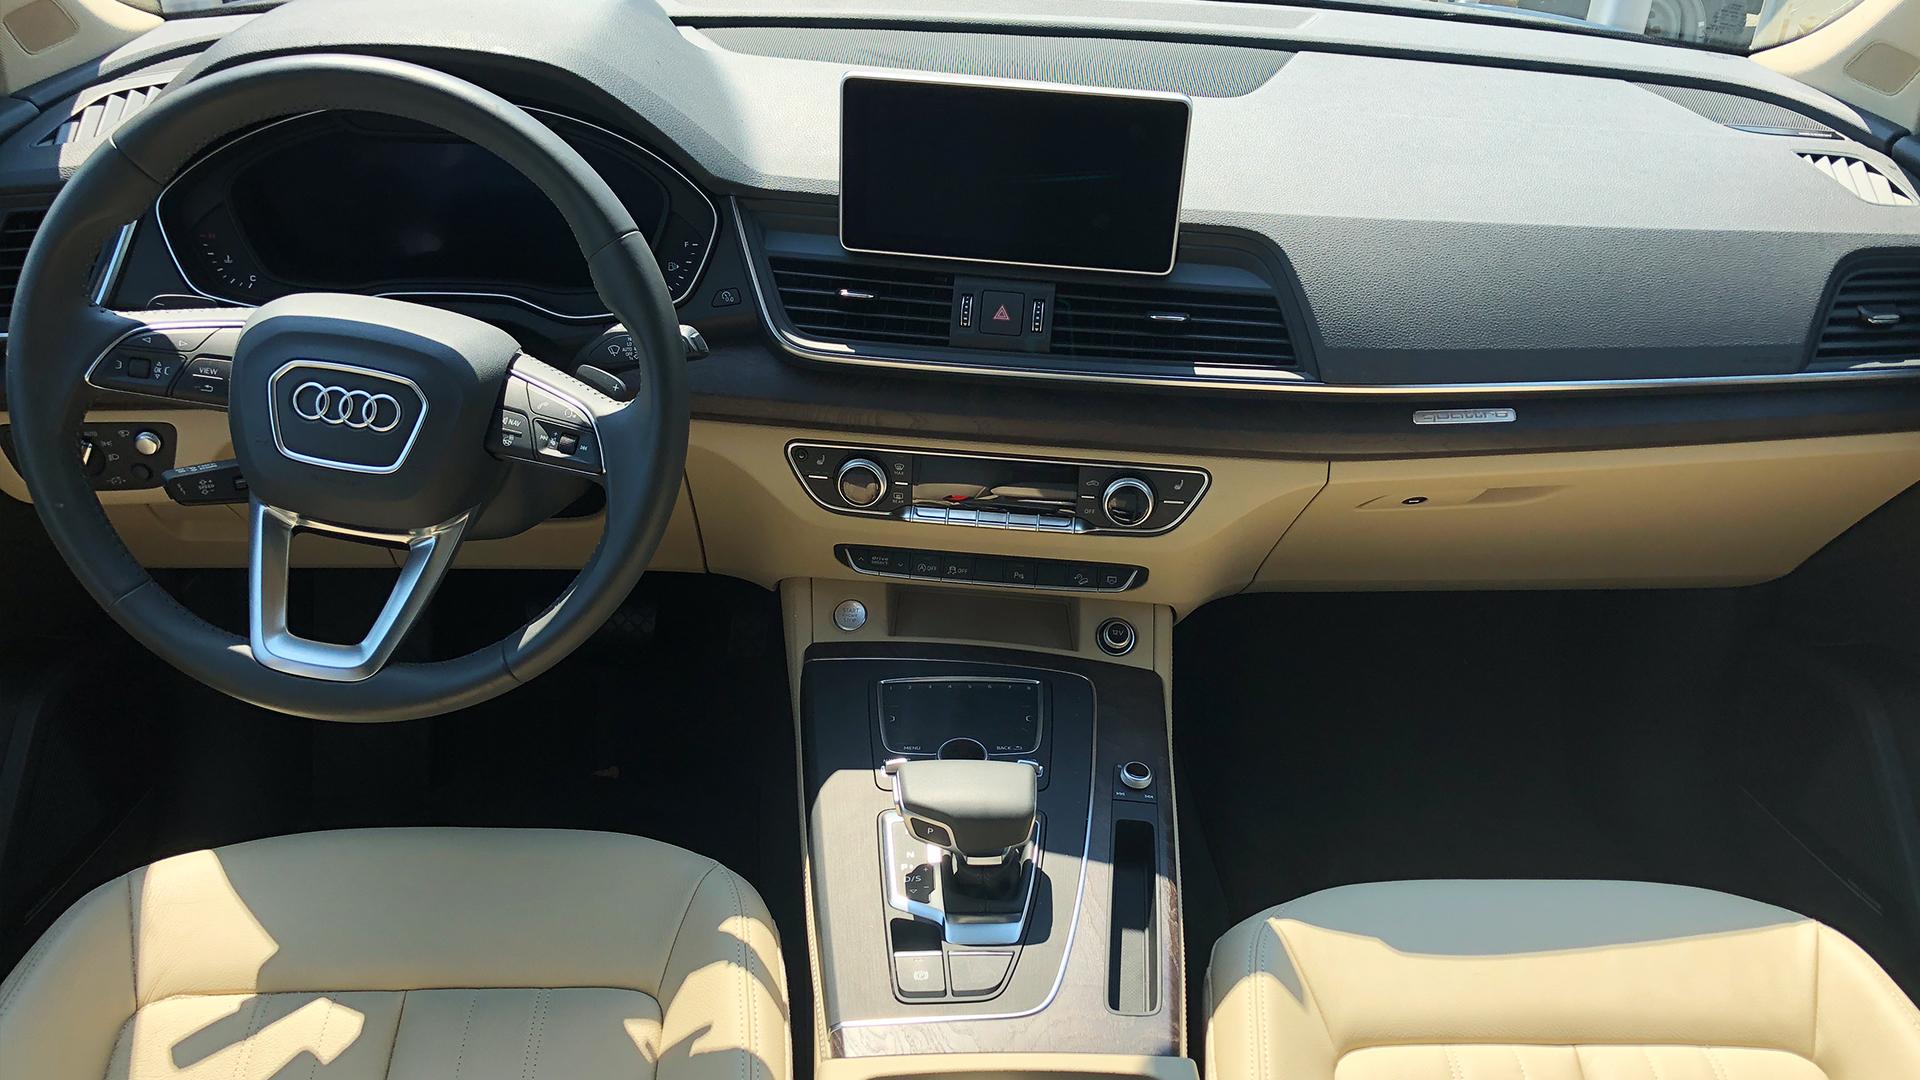 2018 Audi Q5 2 0T Prestige Review: Beauty, Tech, and Brawn, If